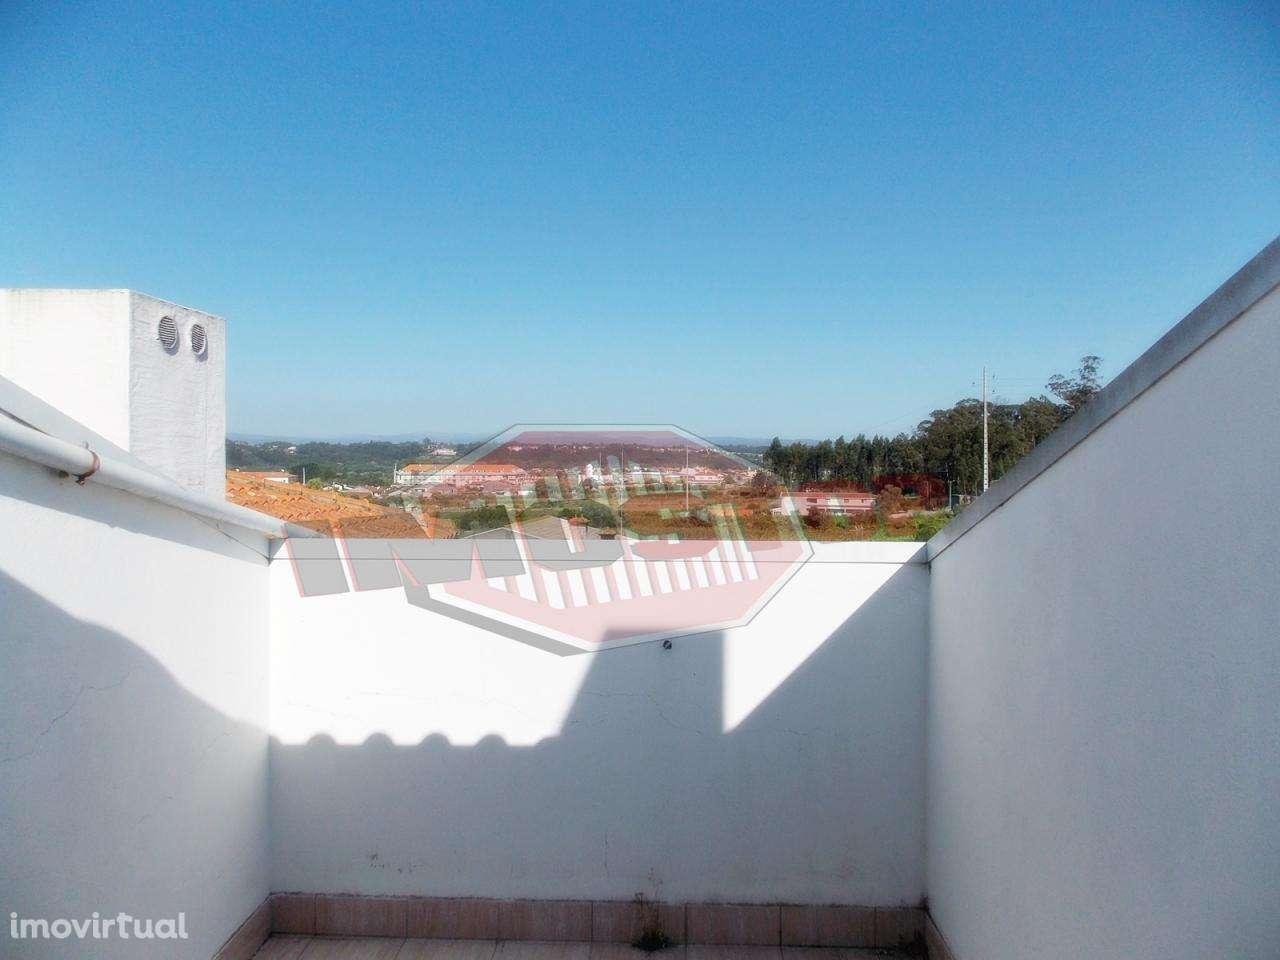 Apartamento para comprar, Oiã, Oliveira do Bairro, Aveiro - Foto 15